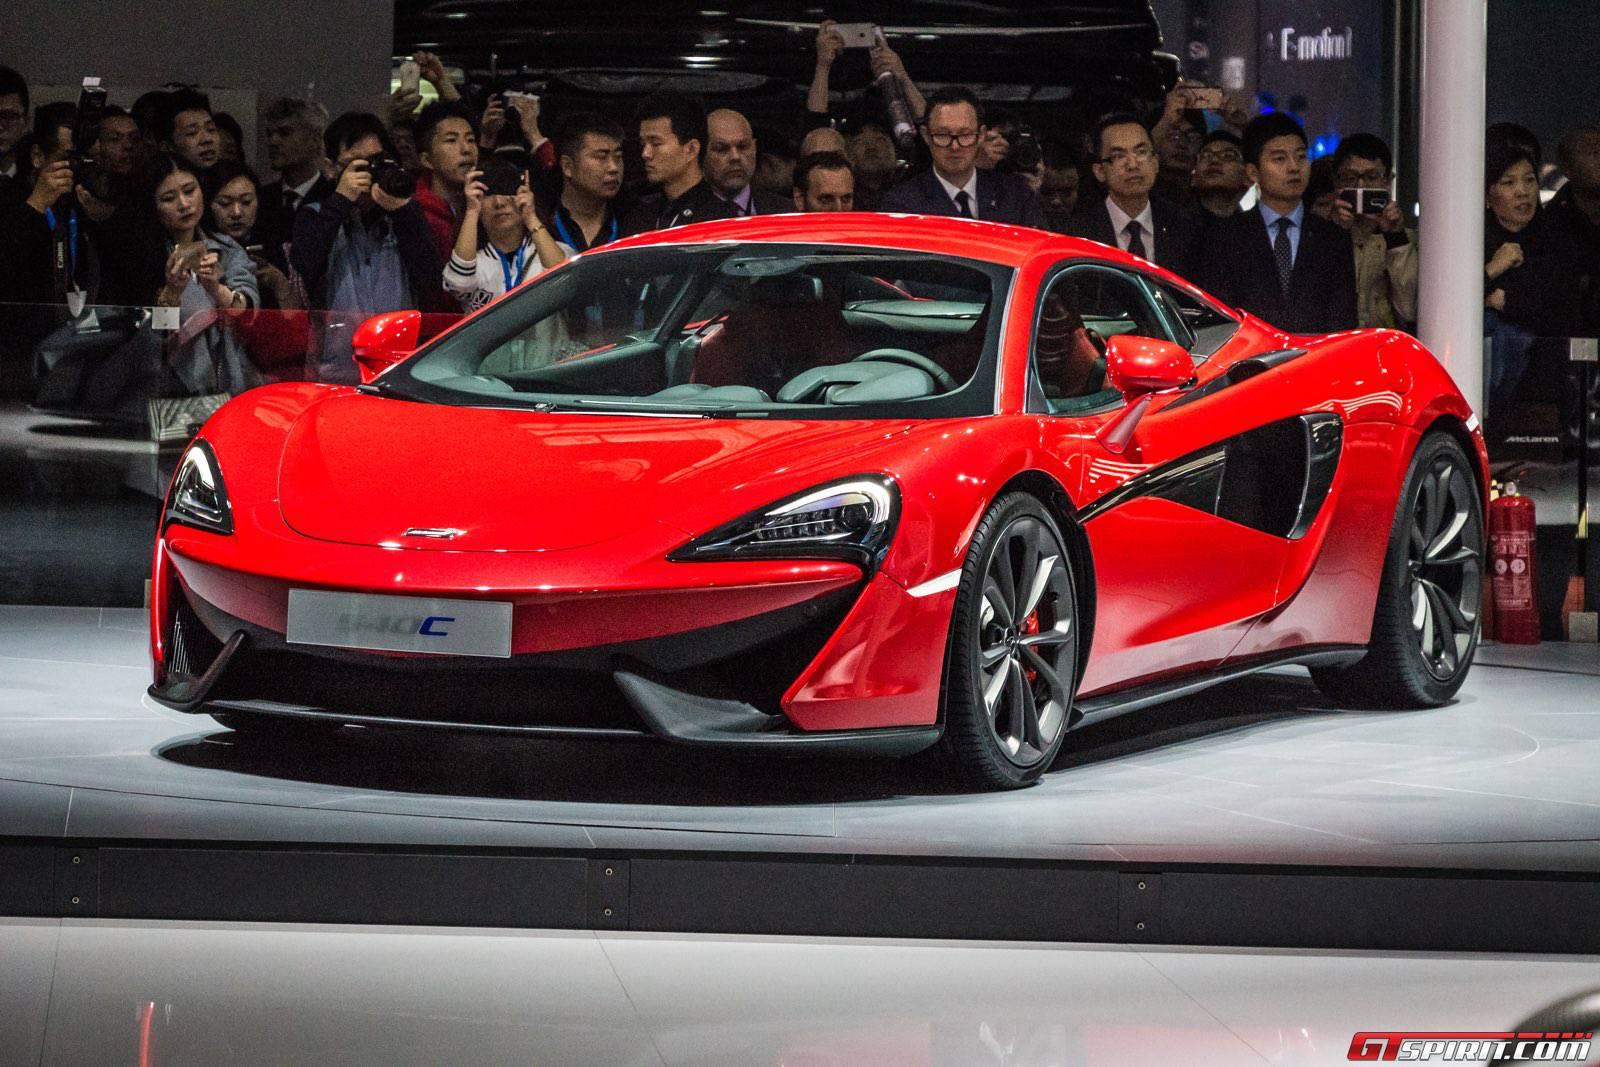 https://storage.googleapis.com/gtspirit/uploads/2015/04/shanghai-auto-show-2015197.jpg